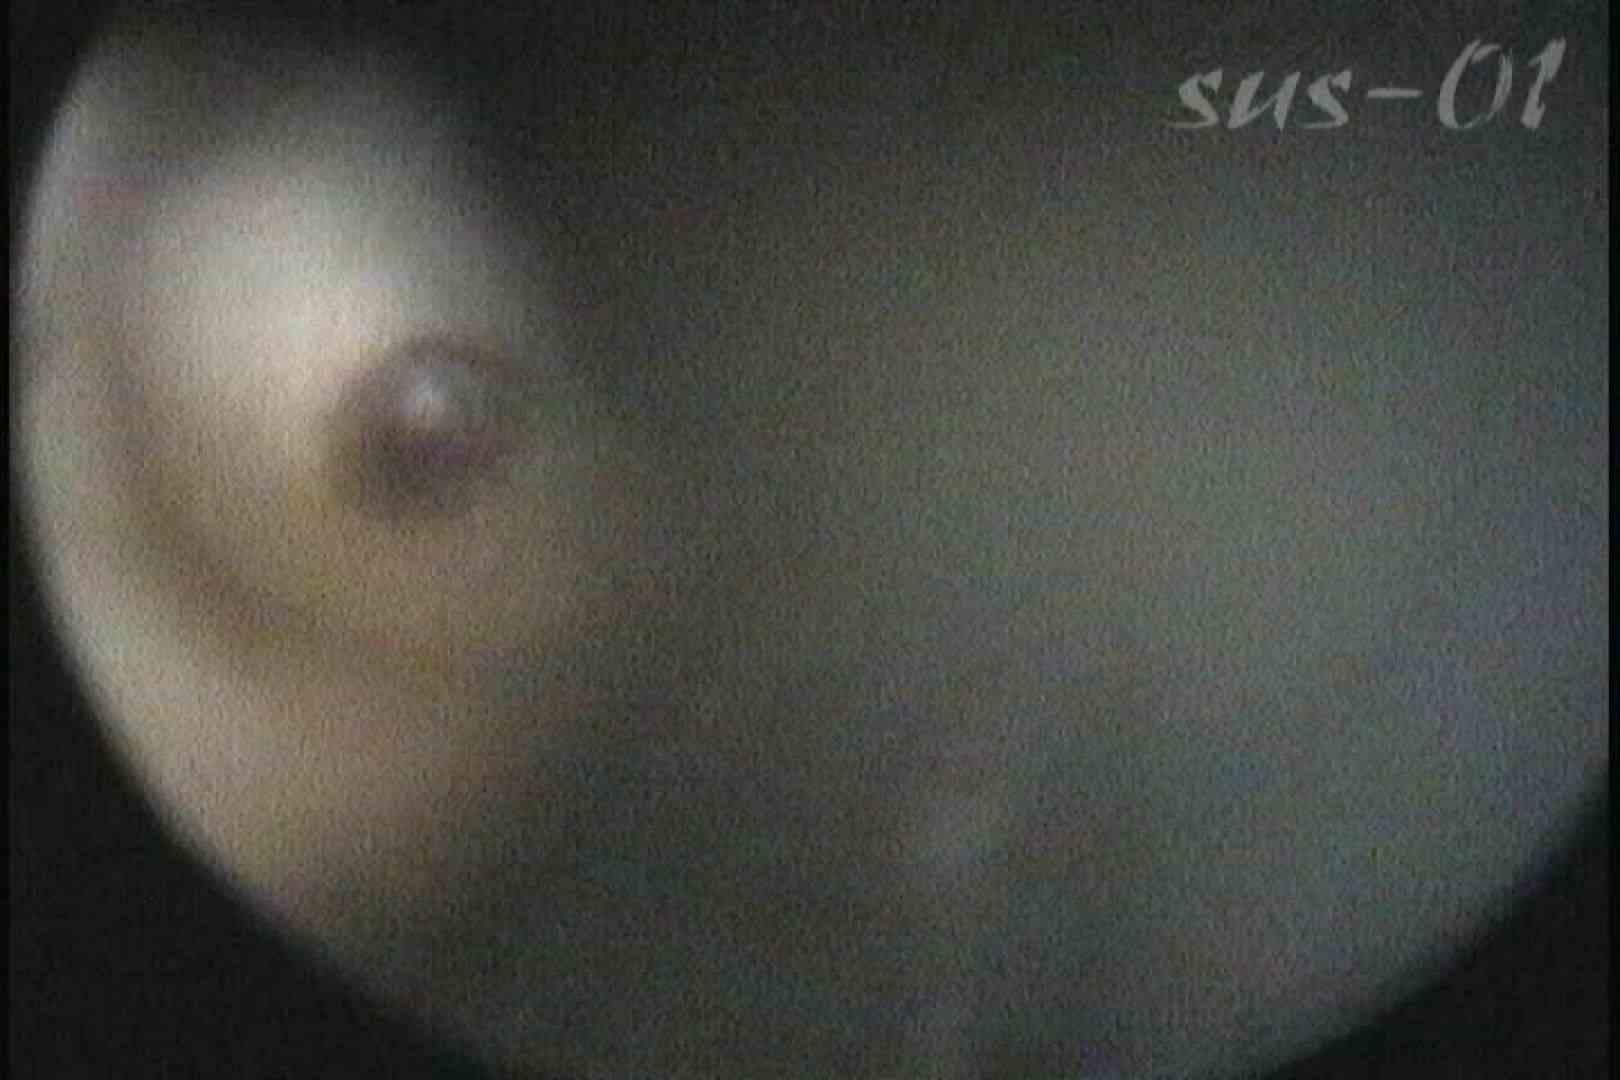 No.3 金髪ギャル 薄い陰毛の奥は一本スジが。 ギャル盗撮映像 ワレメ無修正動画無料 109PIX 58